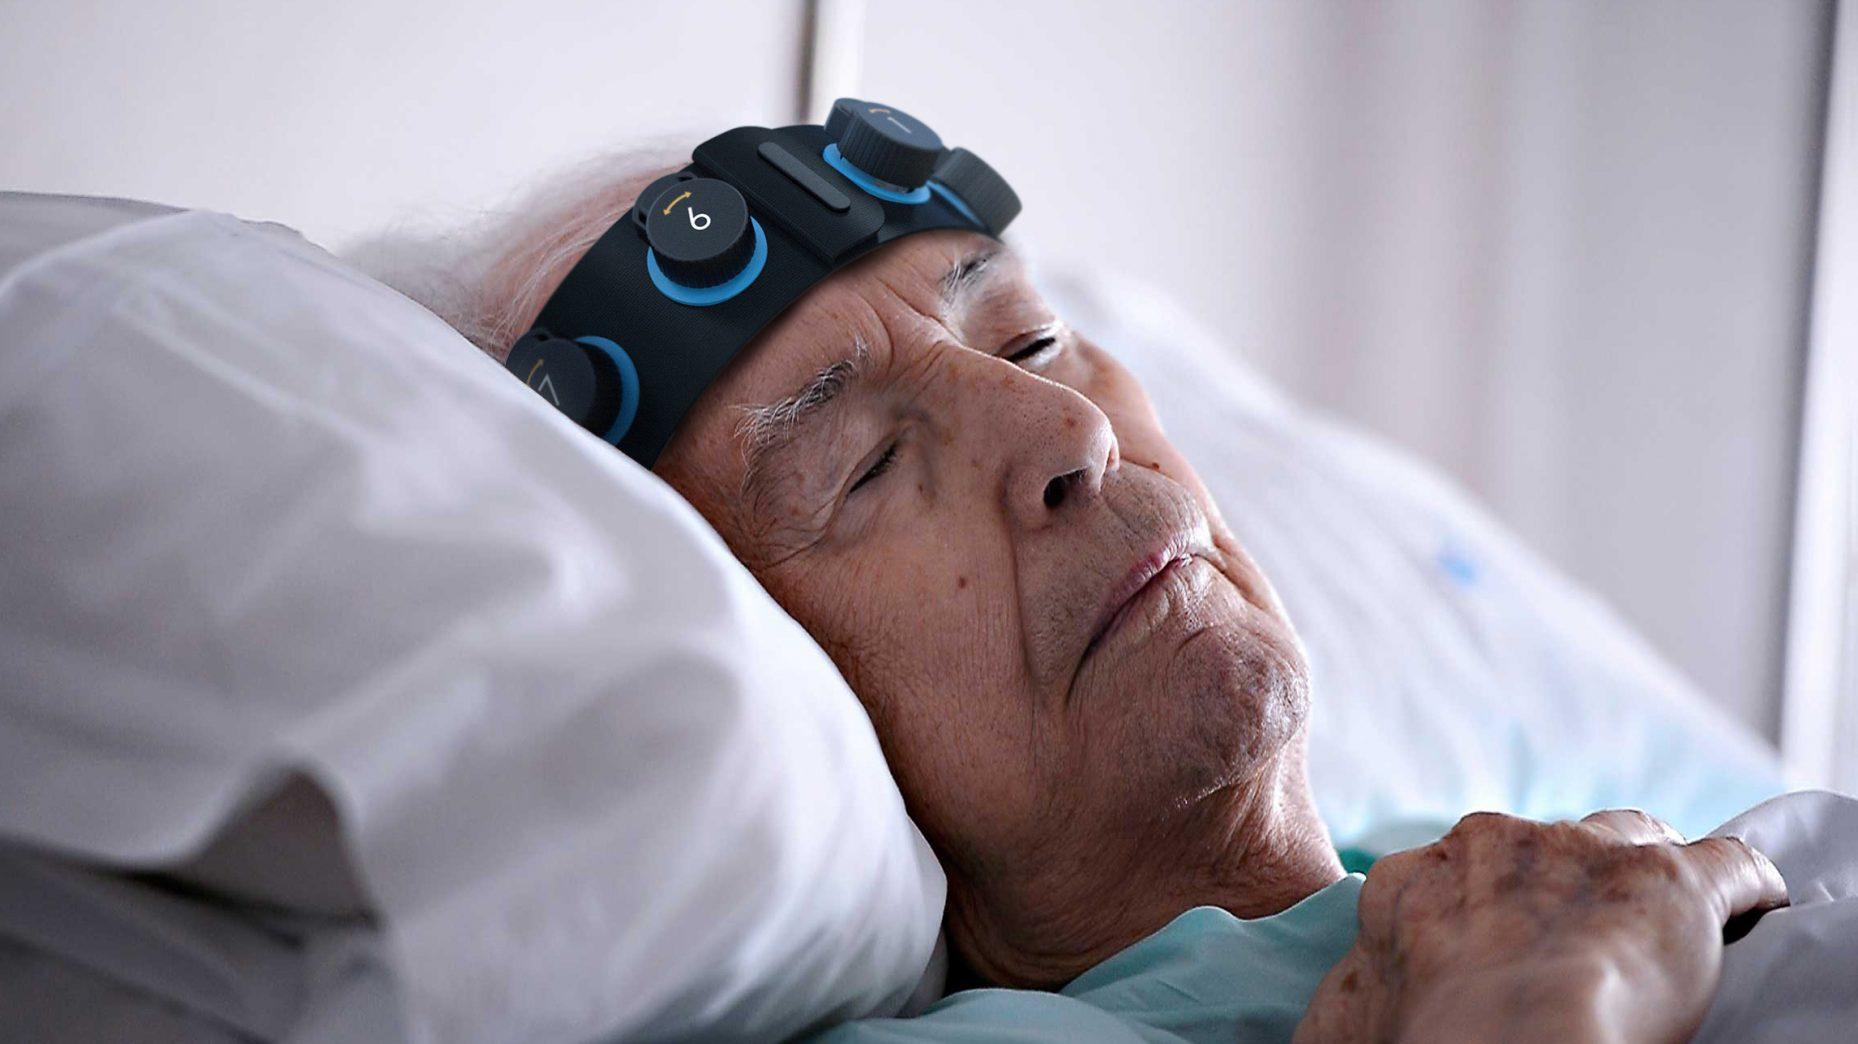 Emergency EEG maker Ceribell raises $35M in series B round | FierceBiotech